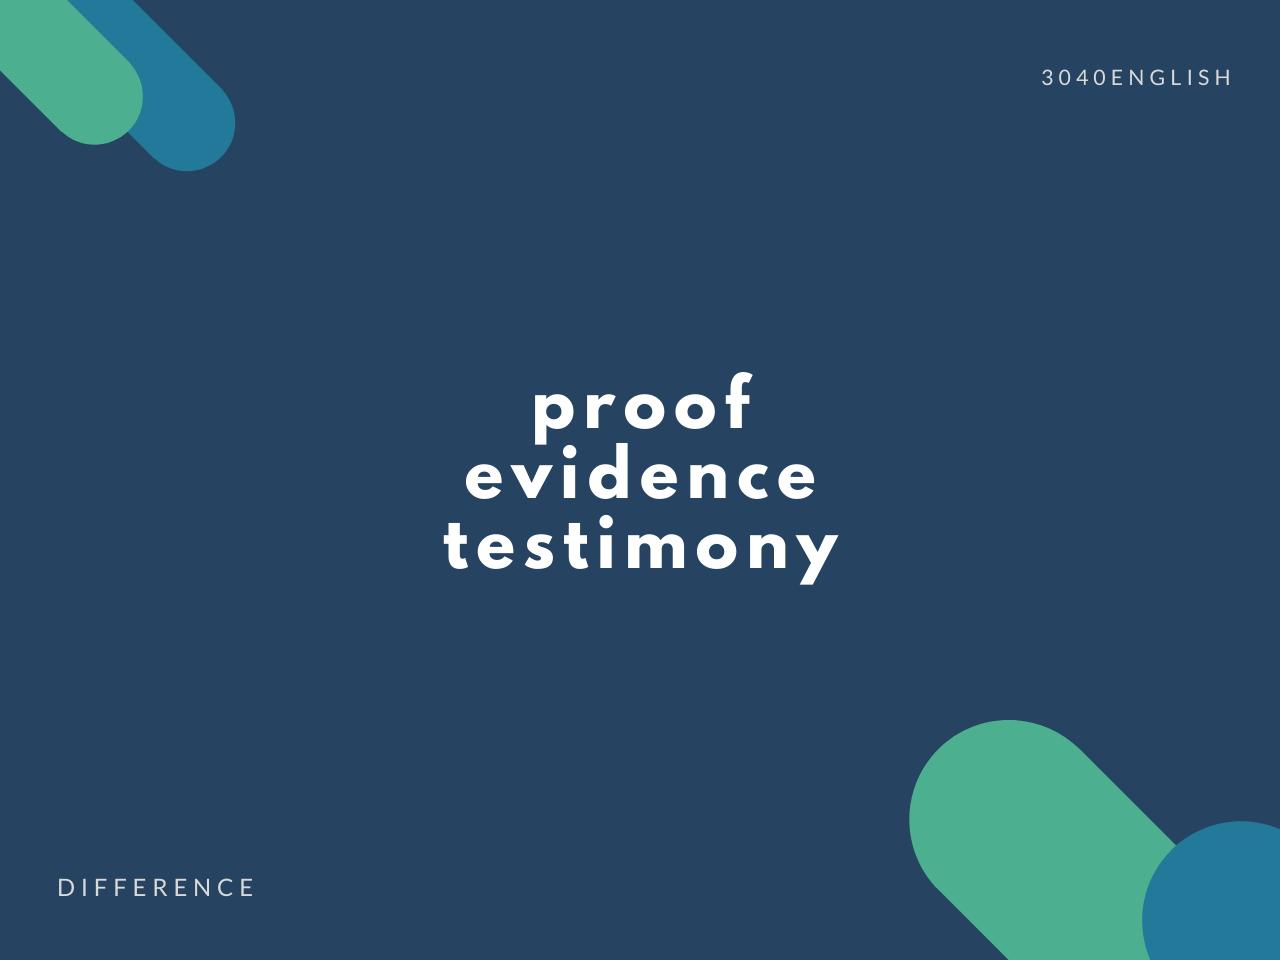 proof, evidence, testimony の違いとは?【例文・説明あり】